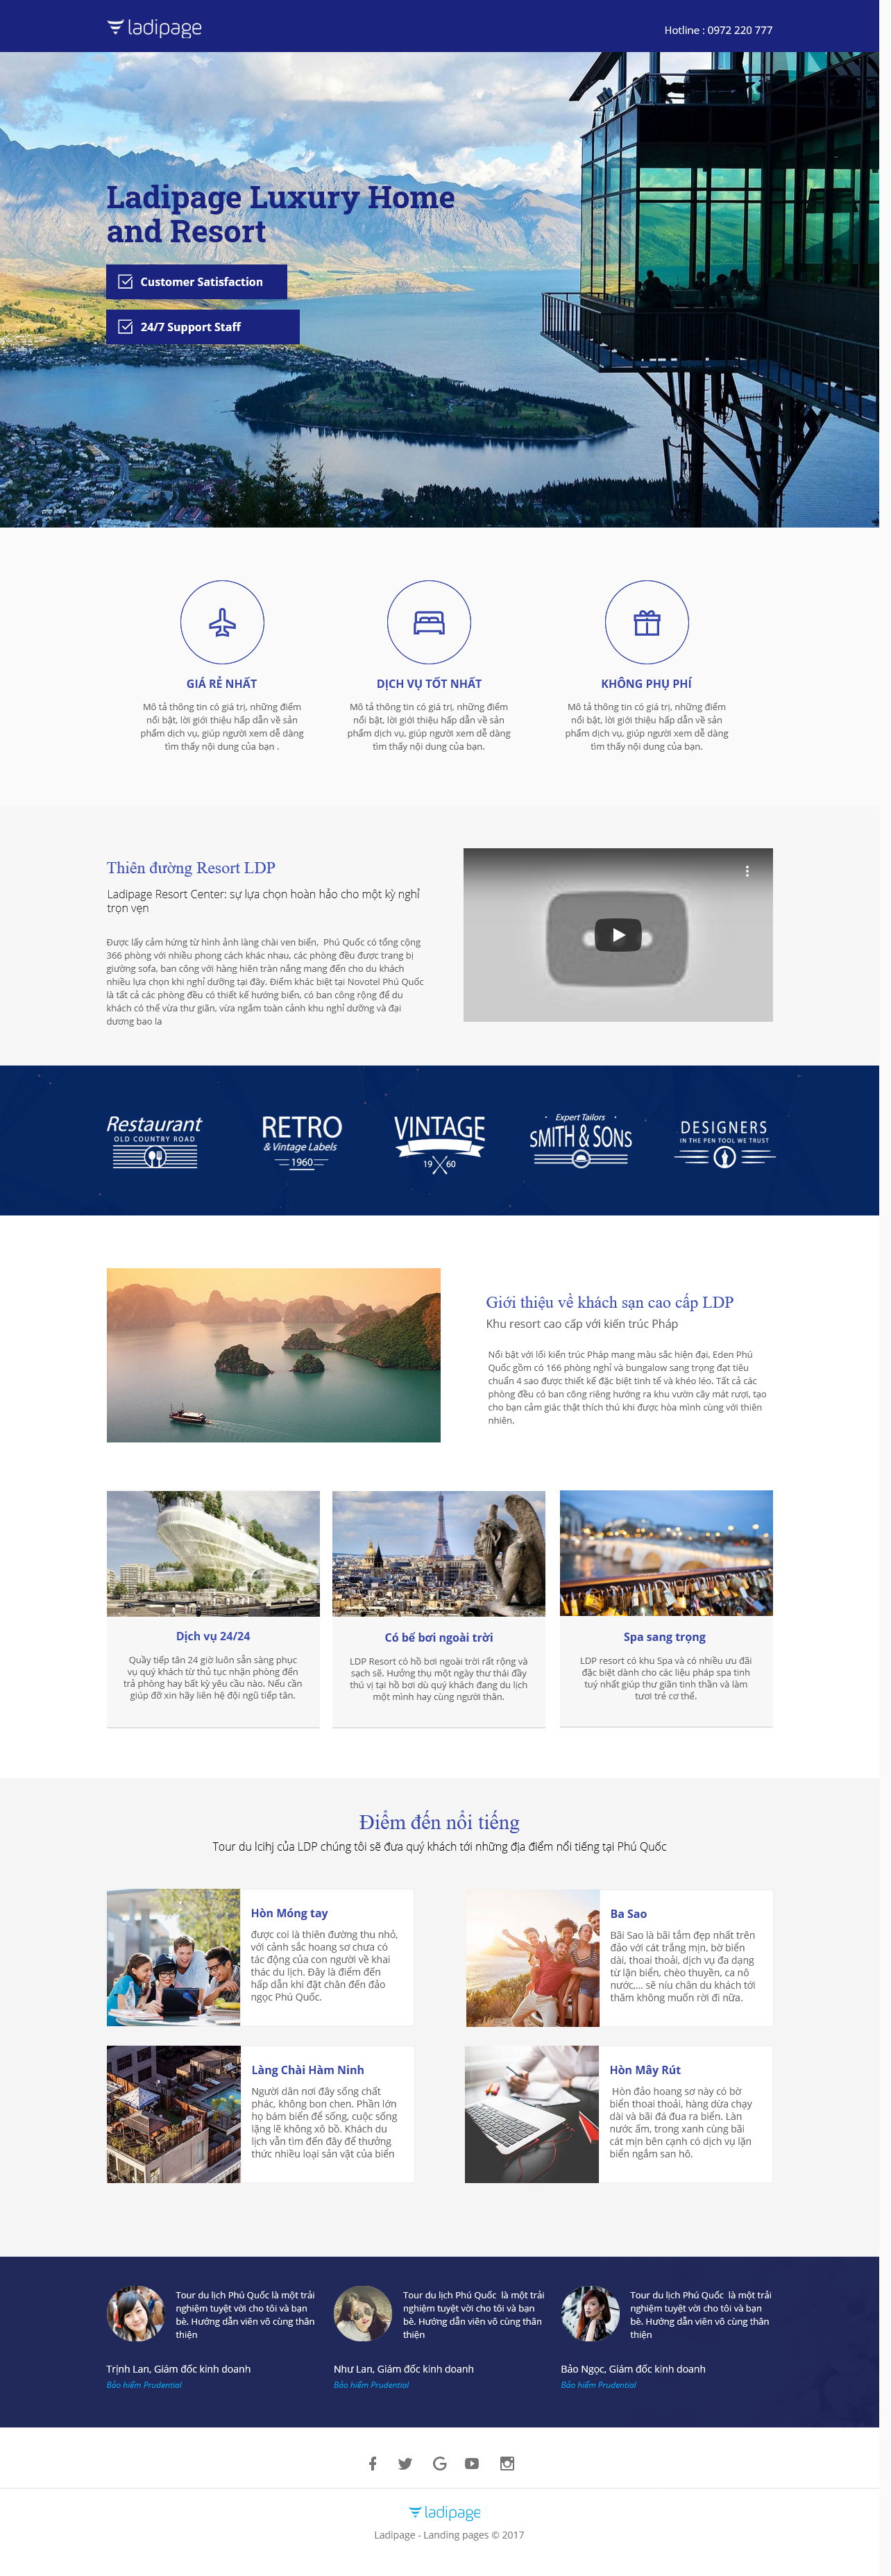 Thiết kế website Thiết kế webiste landingpage du-lich---khach-san---nghi-duong Du lịch 05